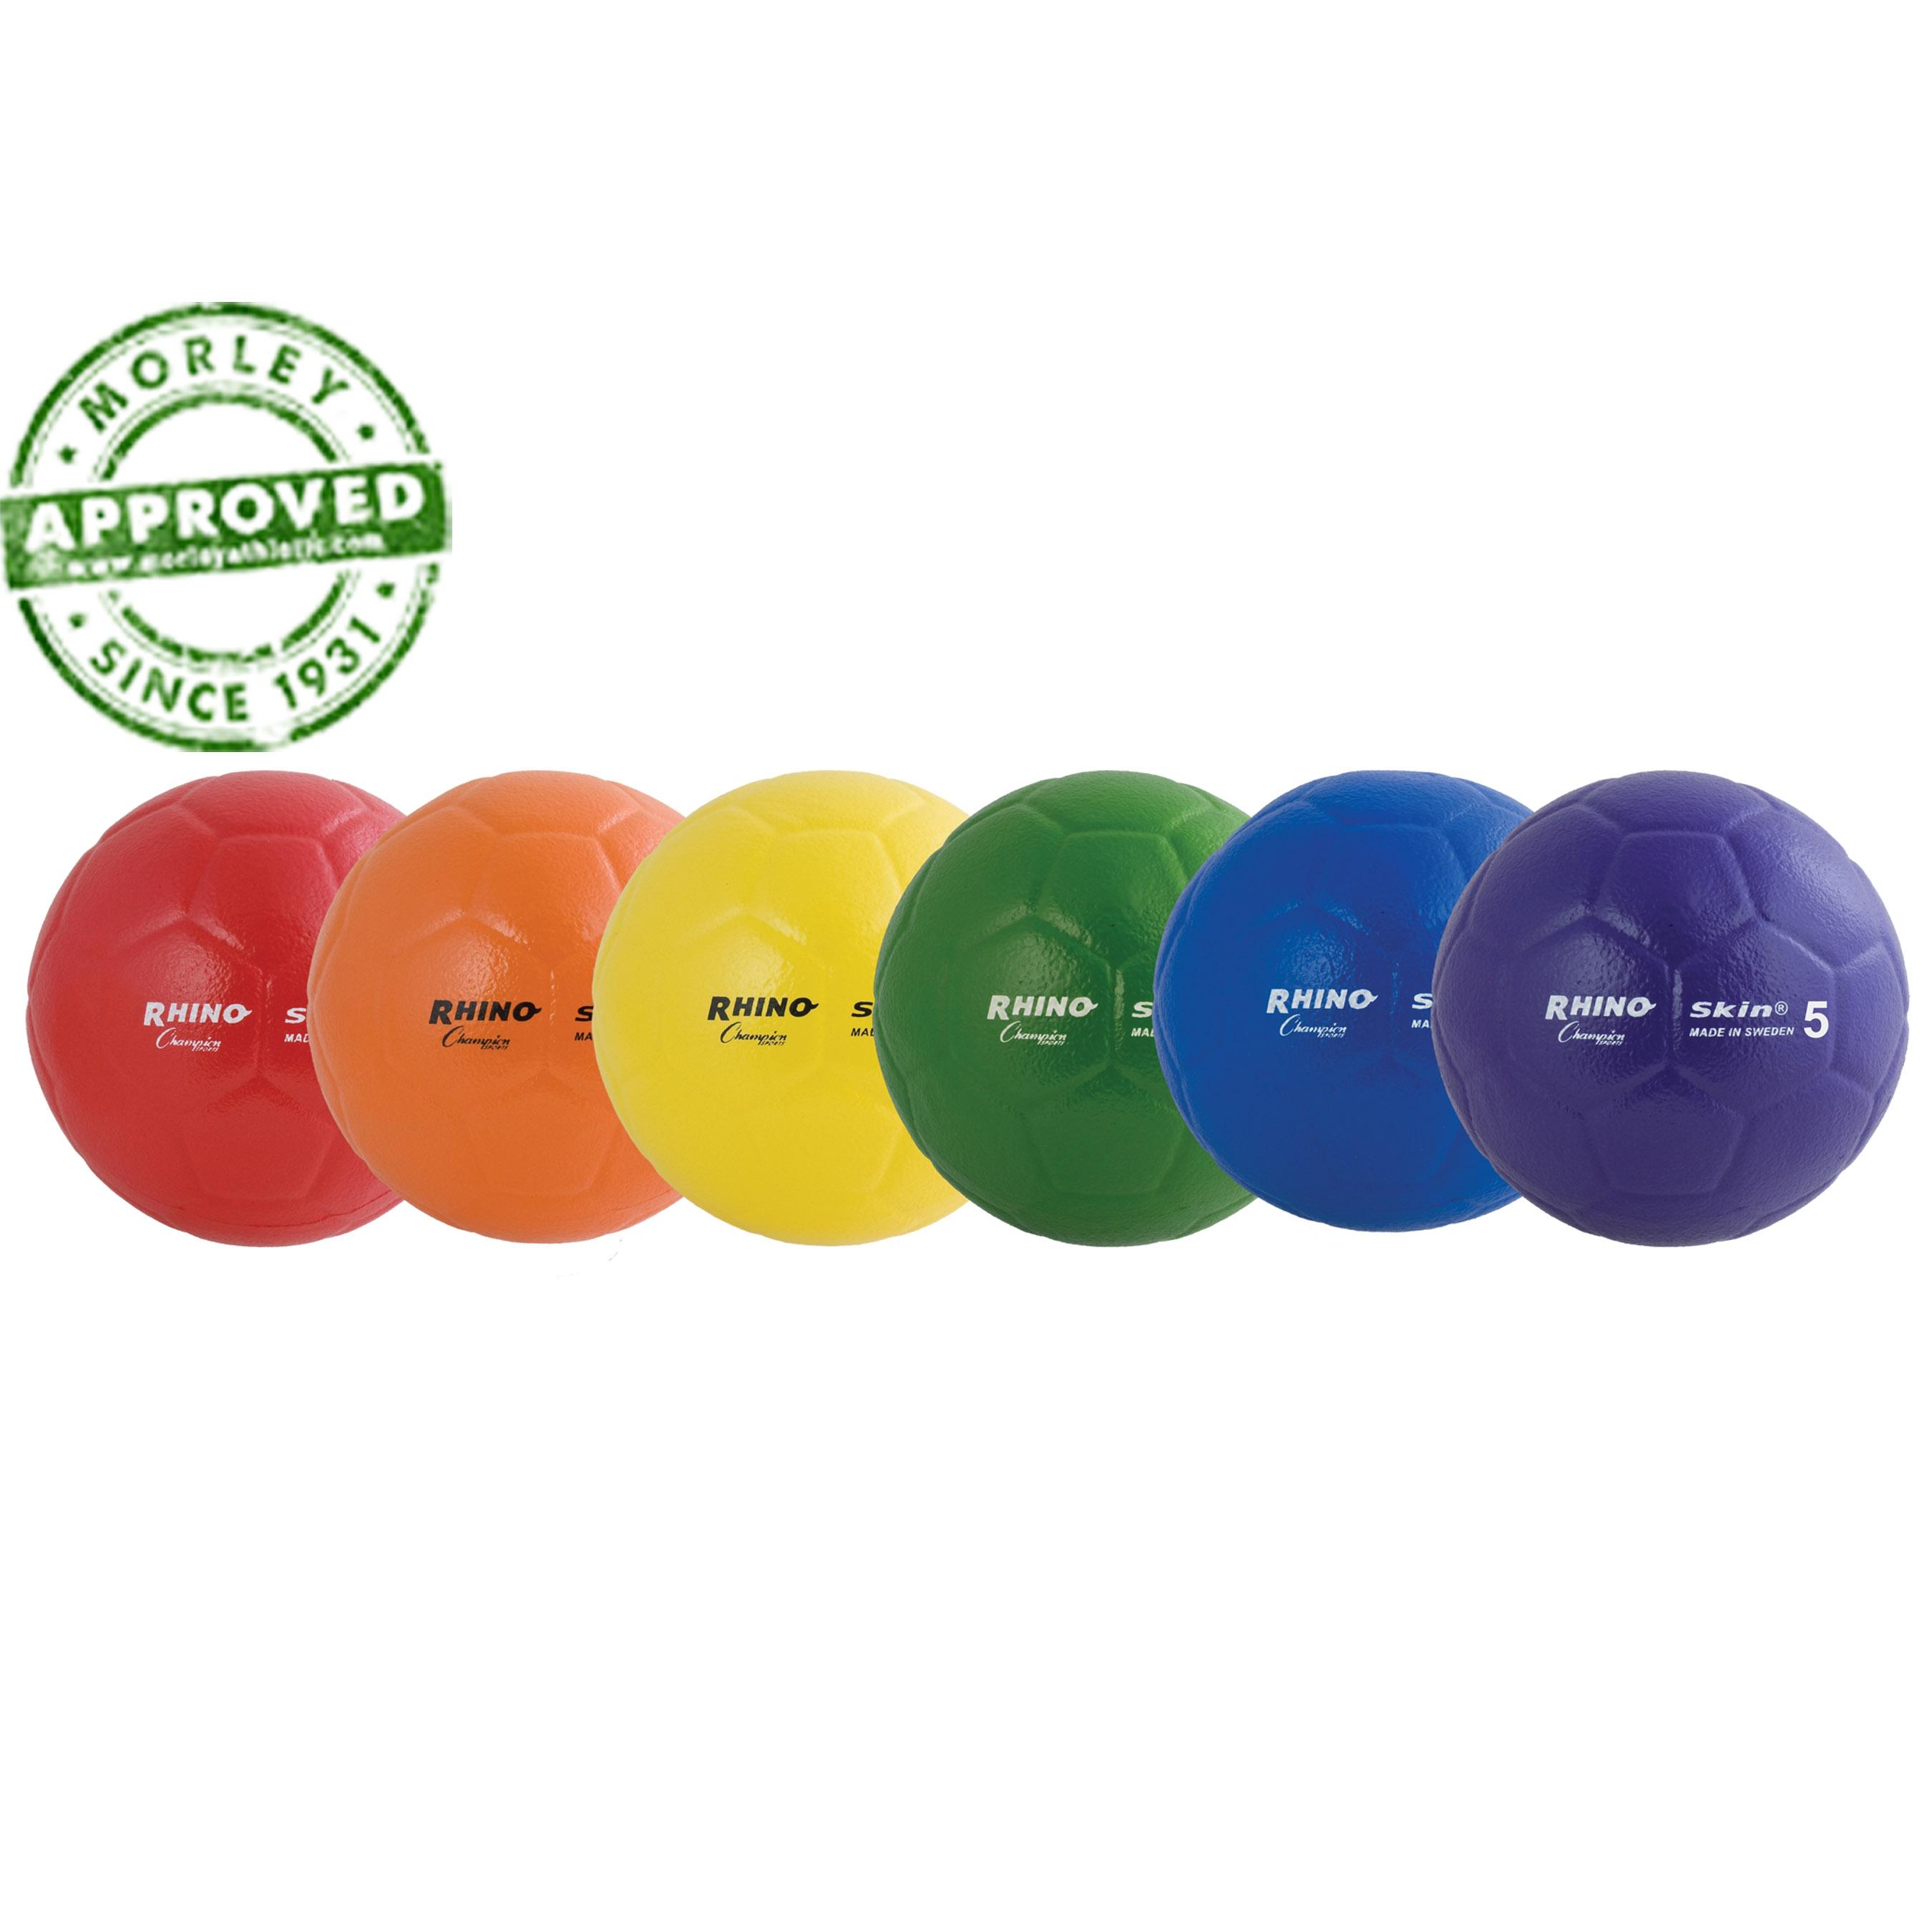 Rhino Skin Foam Size 5 Soccer Ball Rainbow Set Of 6